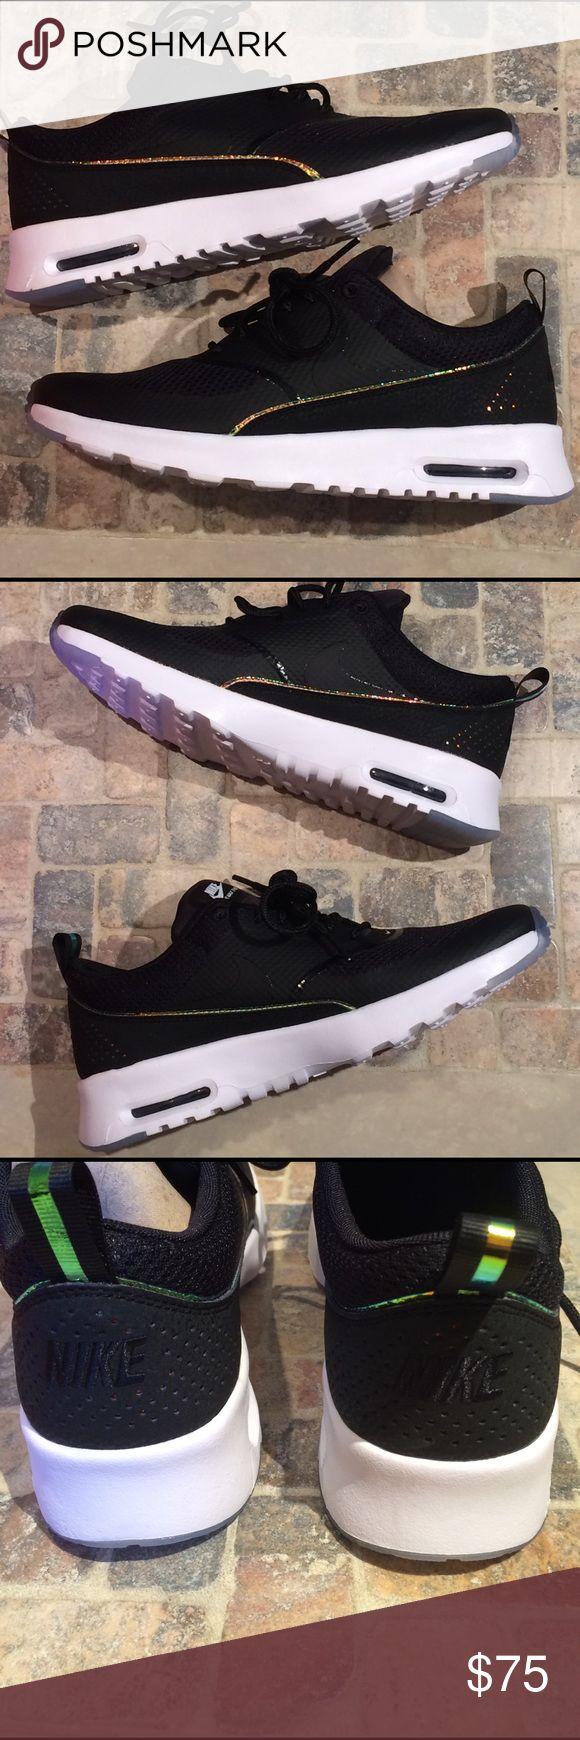 pretty nice fa073 da706 Mujeres Nike Air Max, Mujeres Nike, Air Max Thea, Malla Negro, Nike